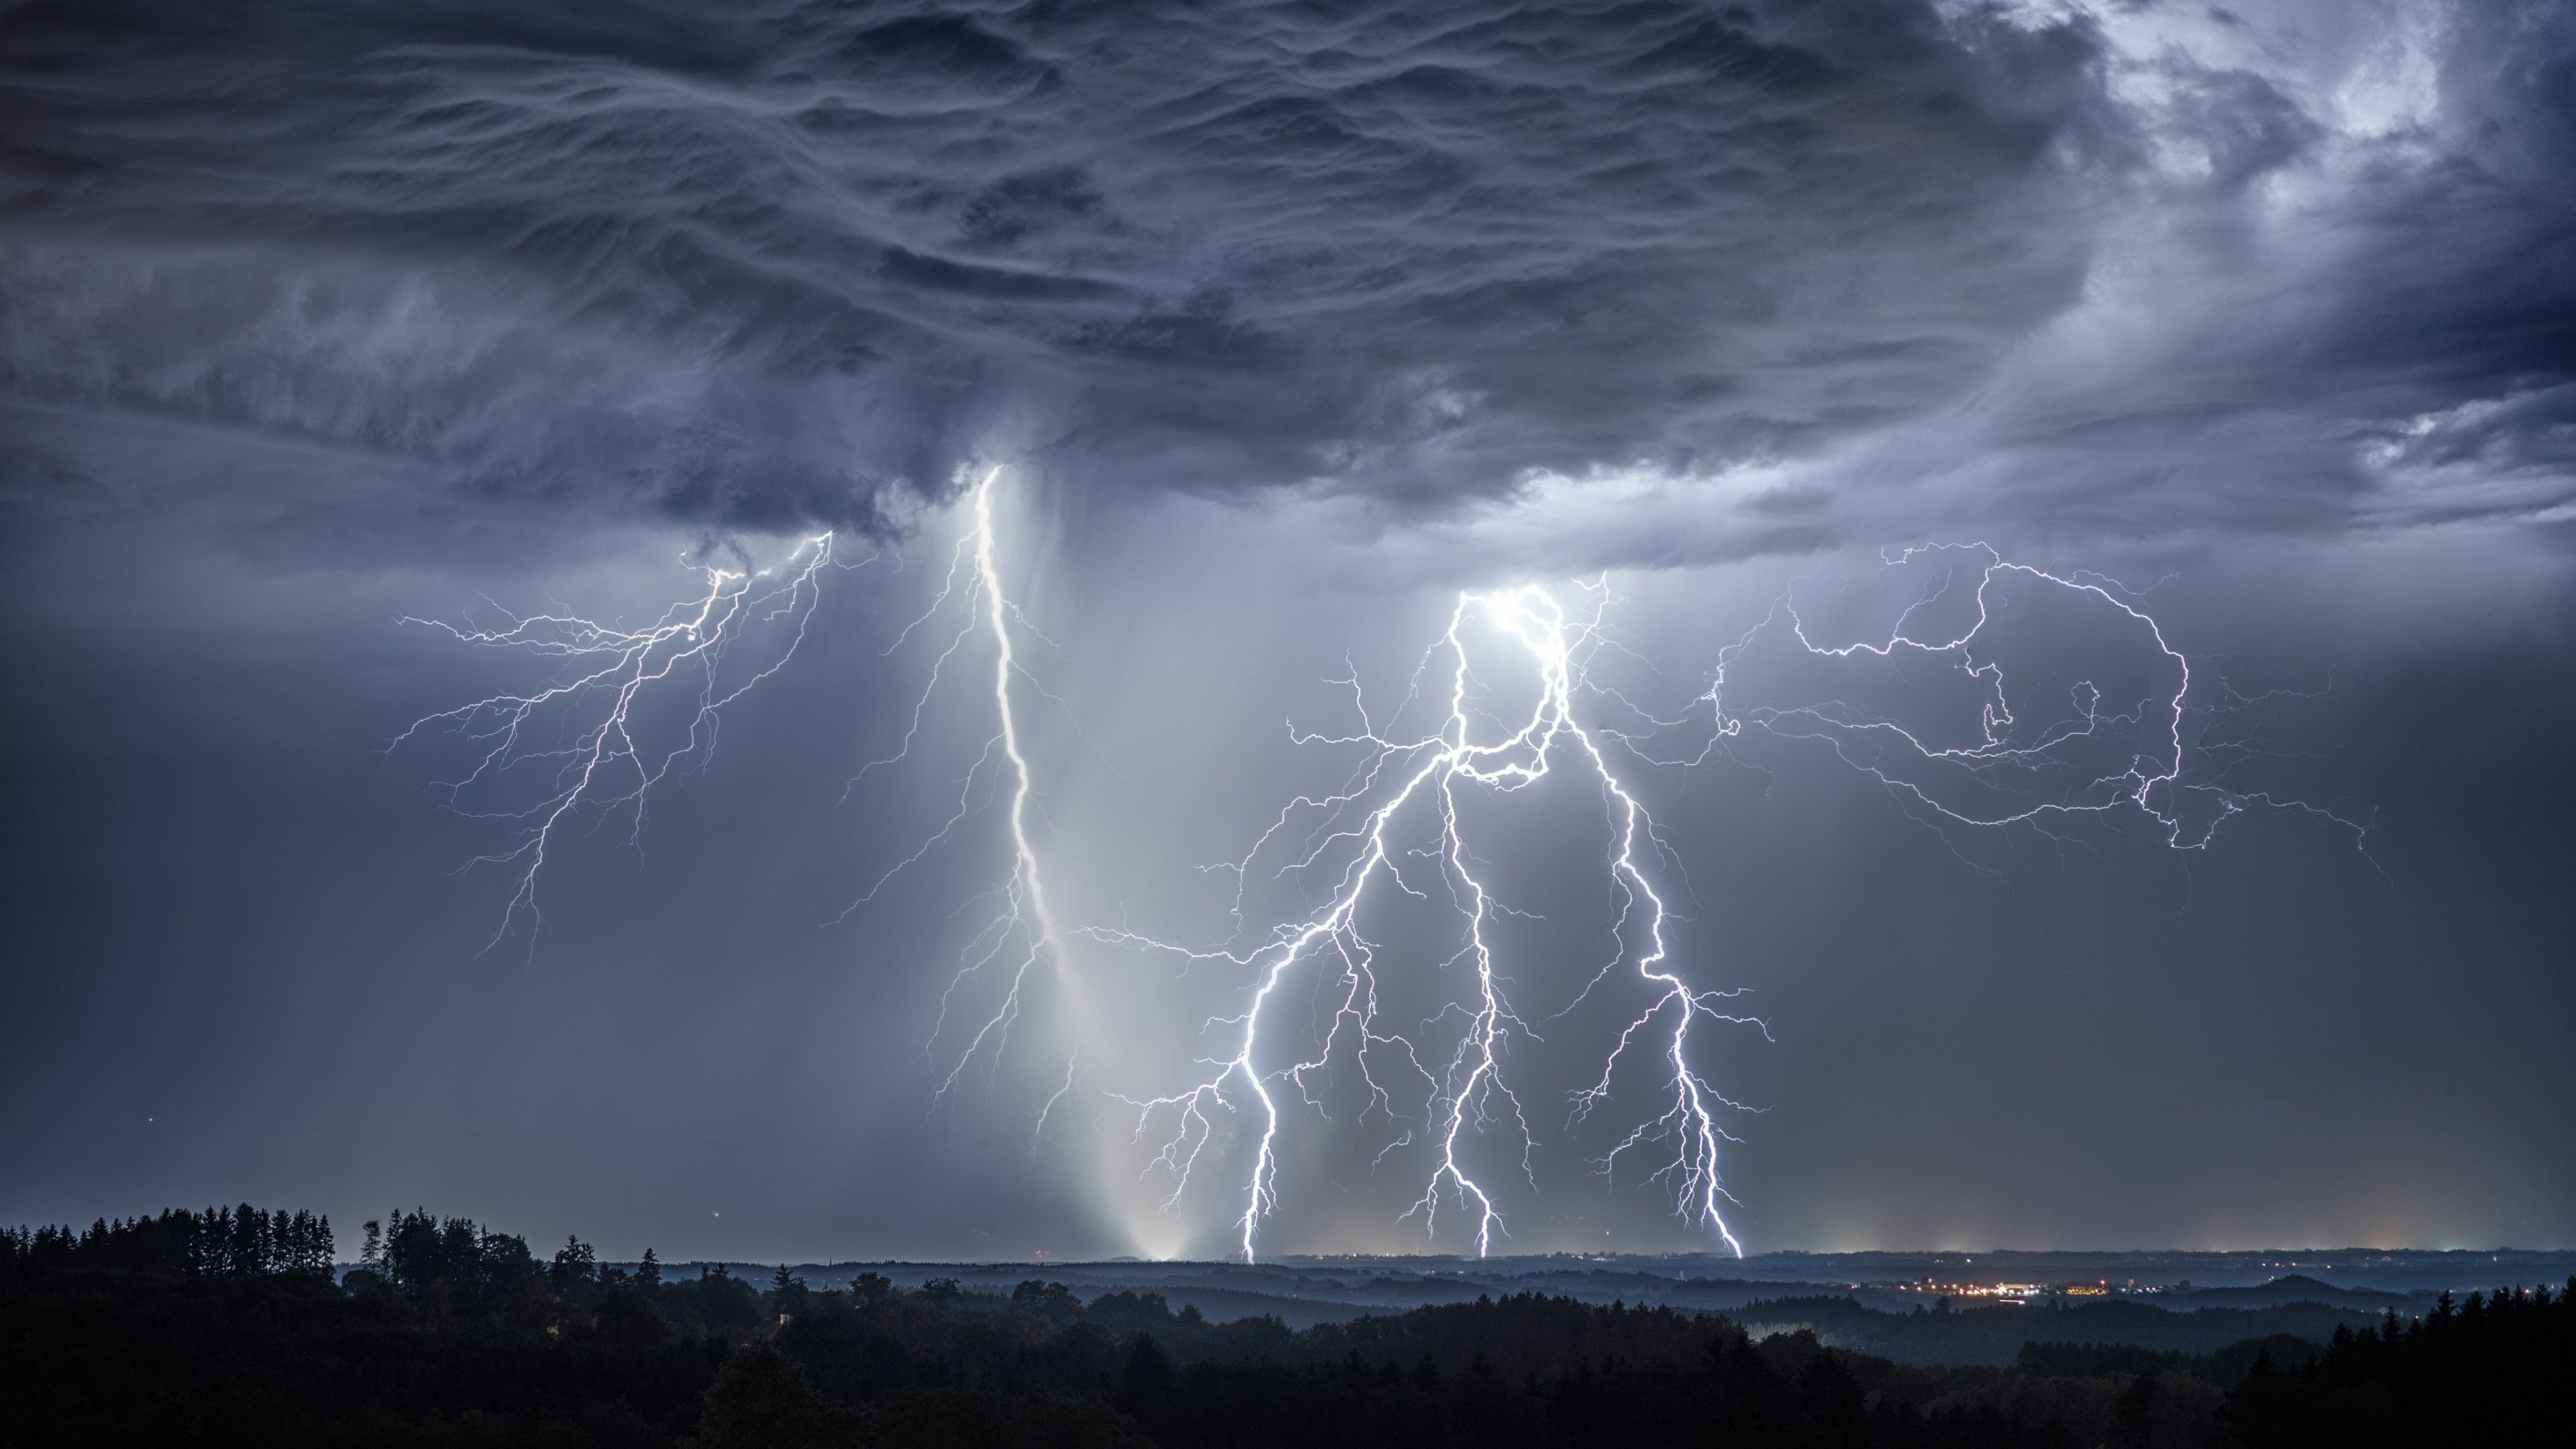 Lightning Thunder Sky Lightning Strikes Cloud Thunderstorm Storm Phenomenon Darkness Cumulus Meteo Lightning Photography Wallpaper Earth Thunderstorms